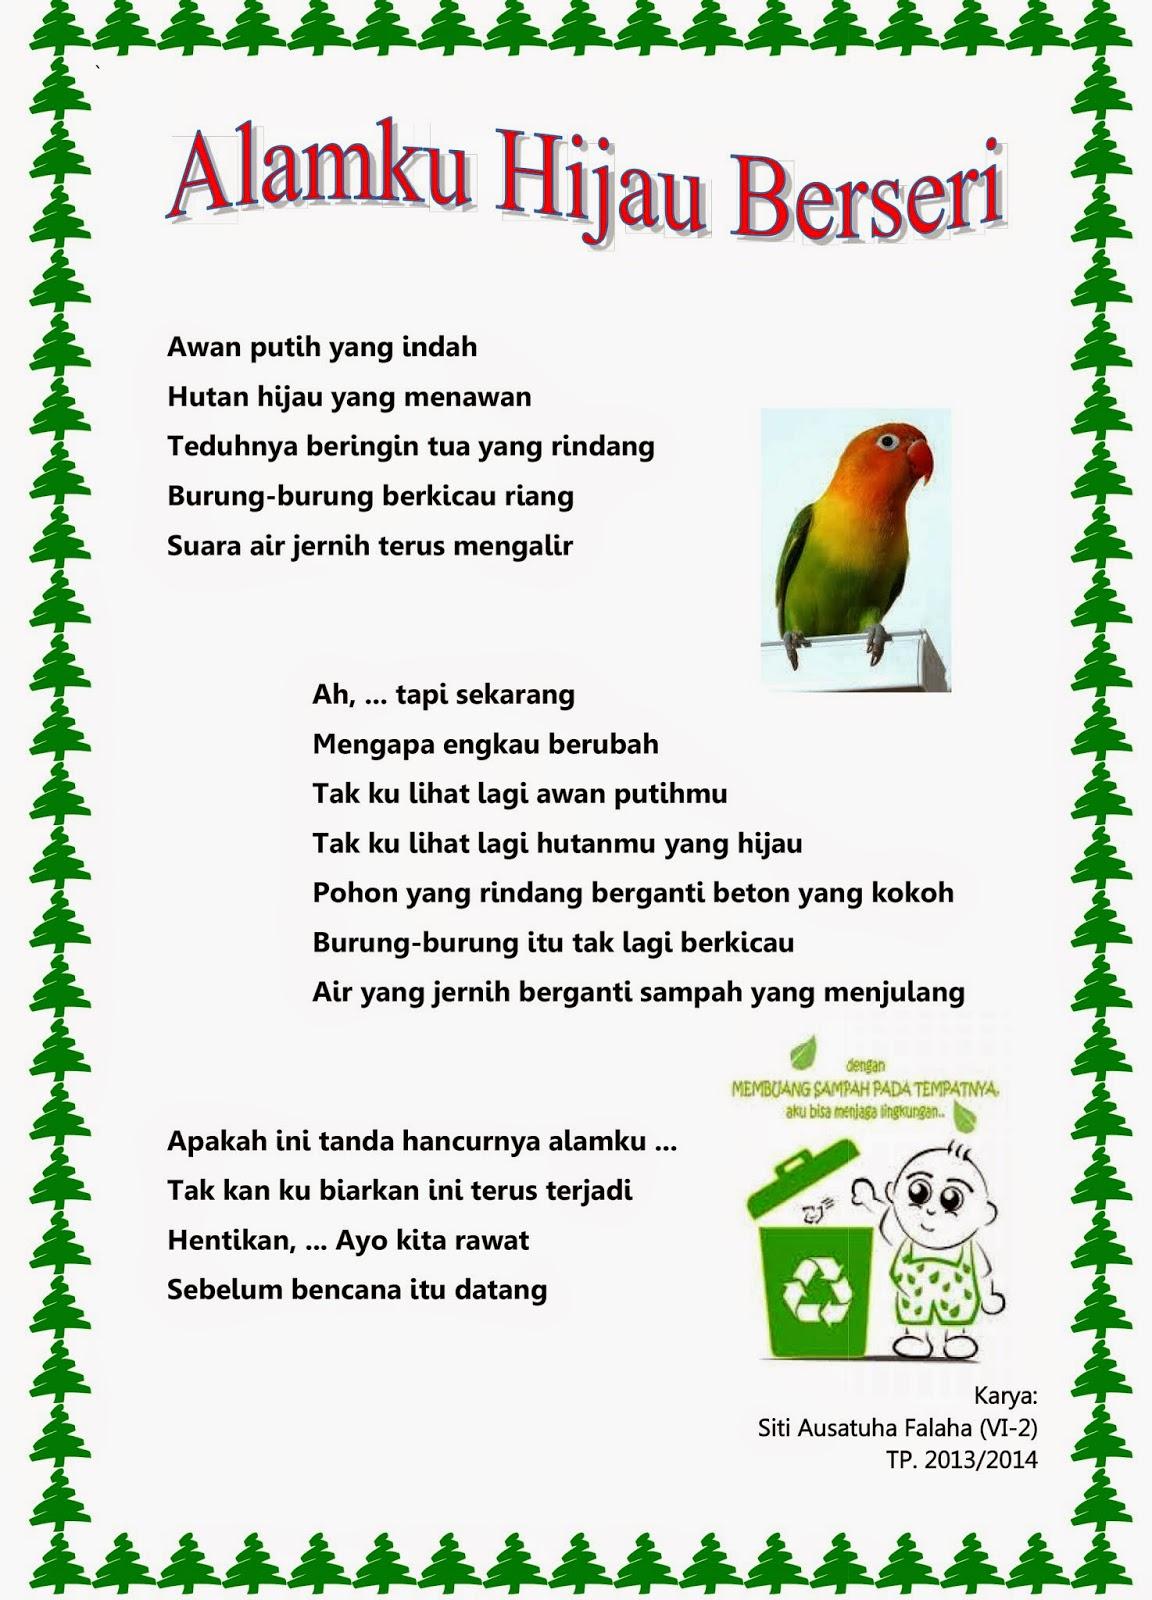 Contoh Puisi Tentang Lingkungan Hidup 4 Bait ♥ Bergambar